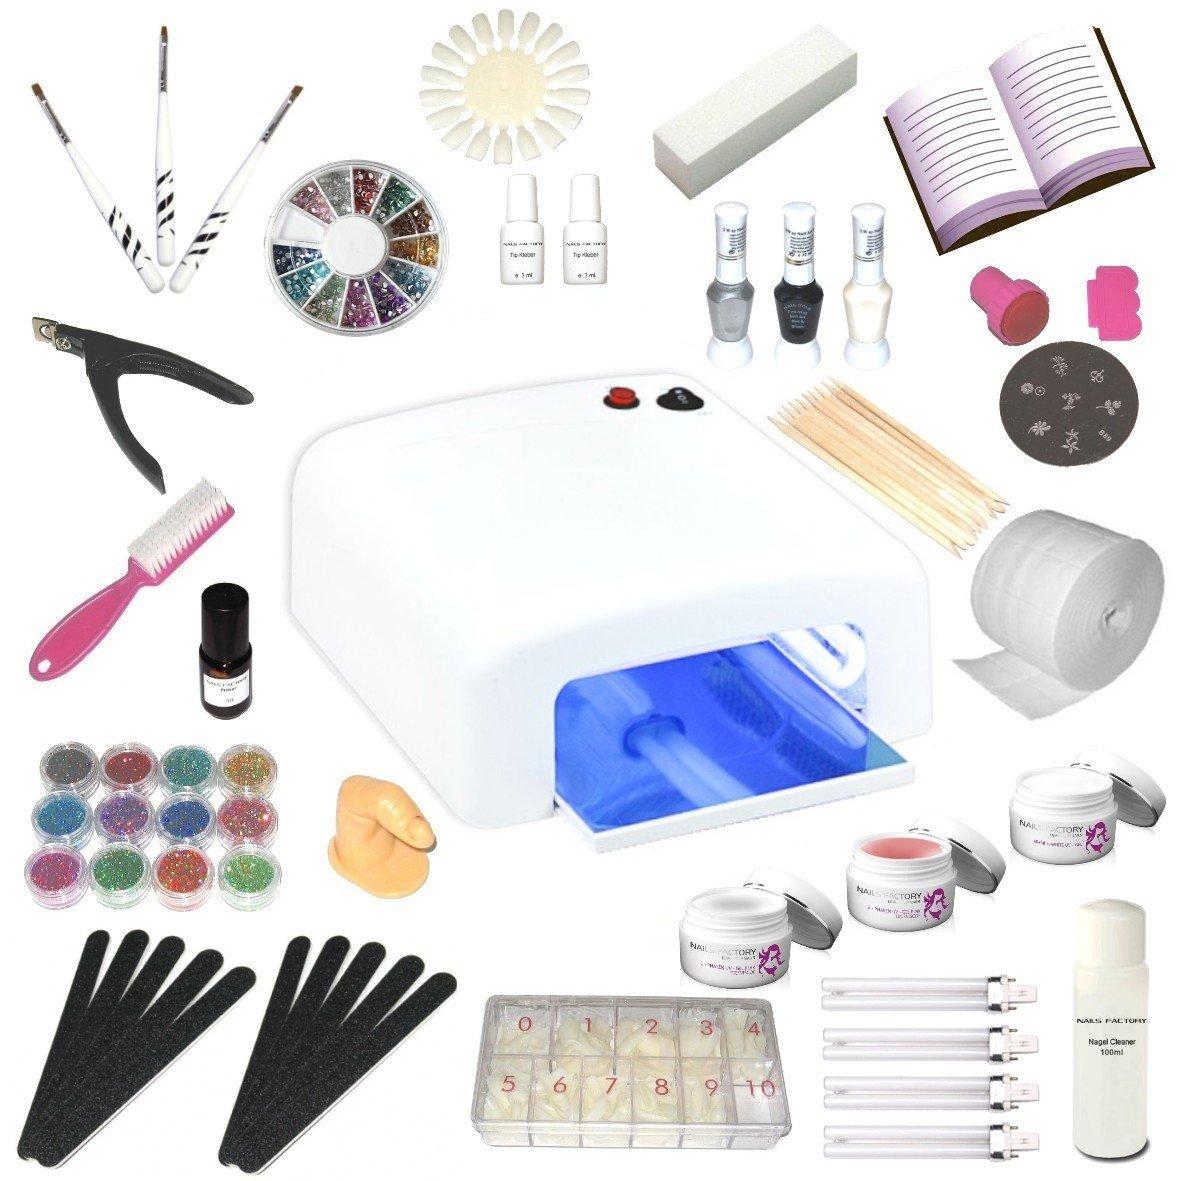 UV-Gel XXXL Set, 4 Röhren Gerät, Nails,